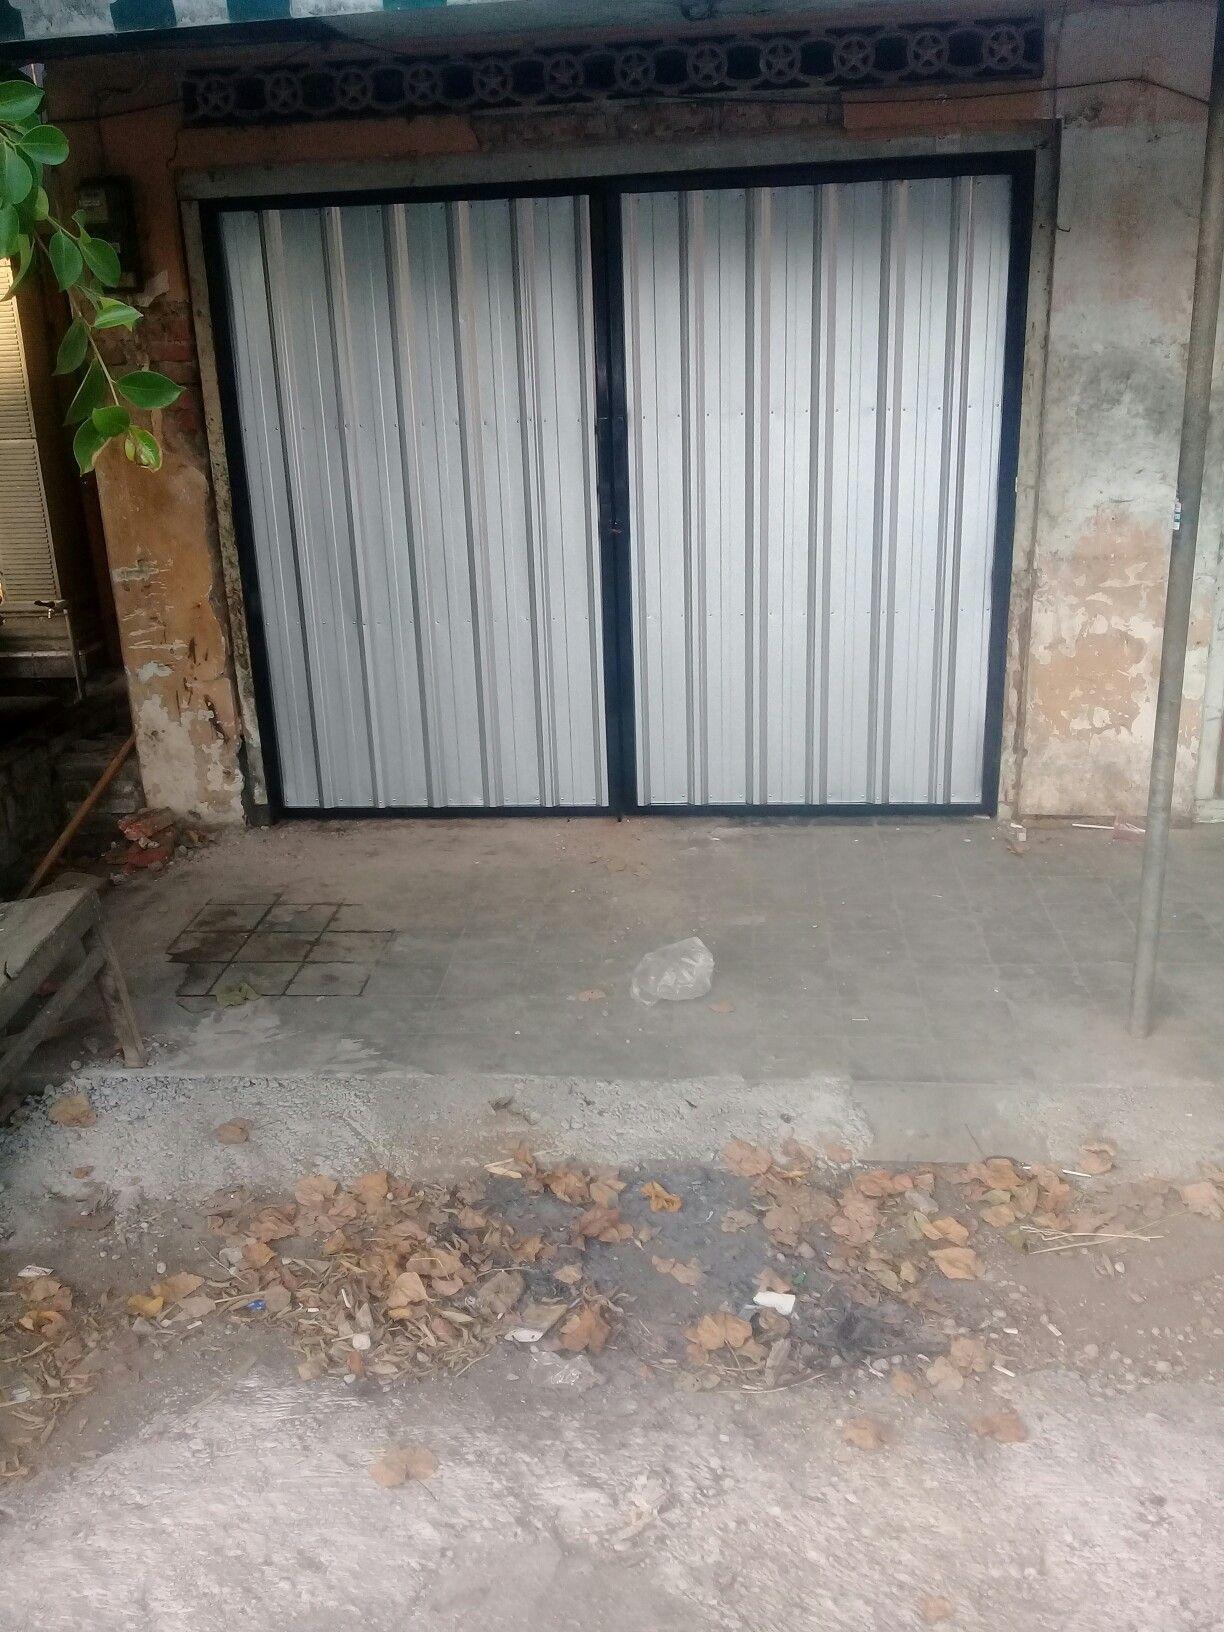 Garasi Mobil Sederhana : garasi, mobil, sederhana, Pintu, Garasi, Mobil, Sederhana, Images, Konstruksi, Sipil